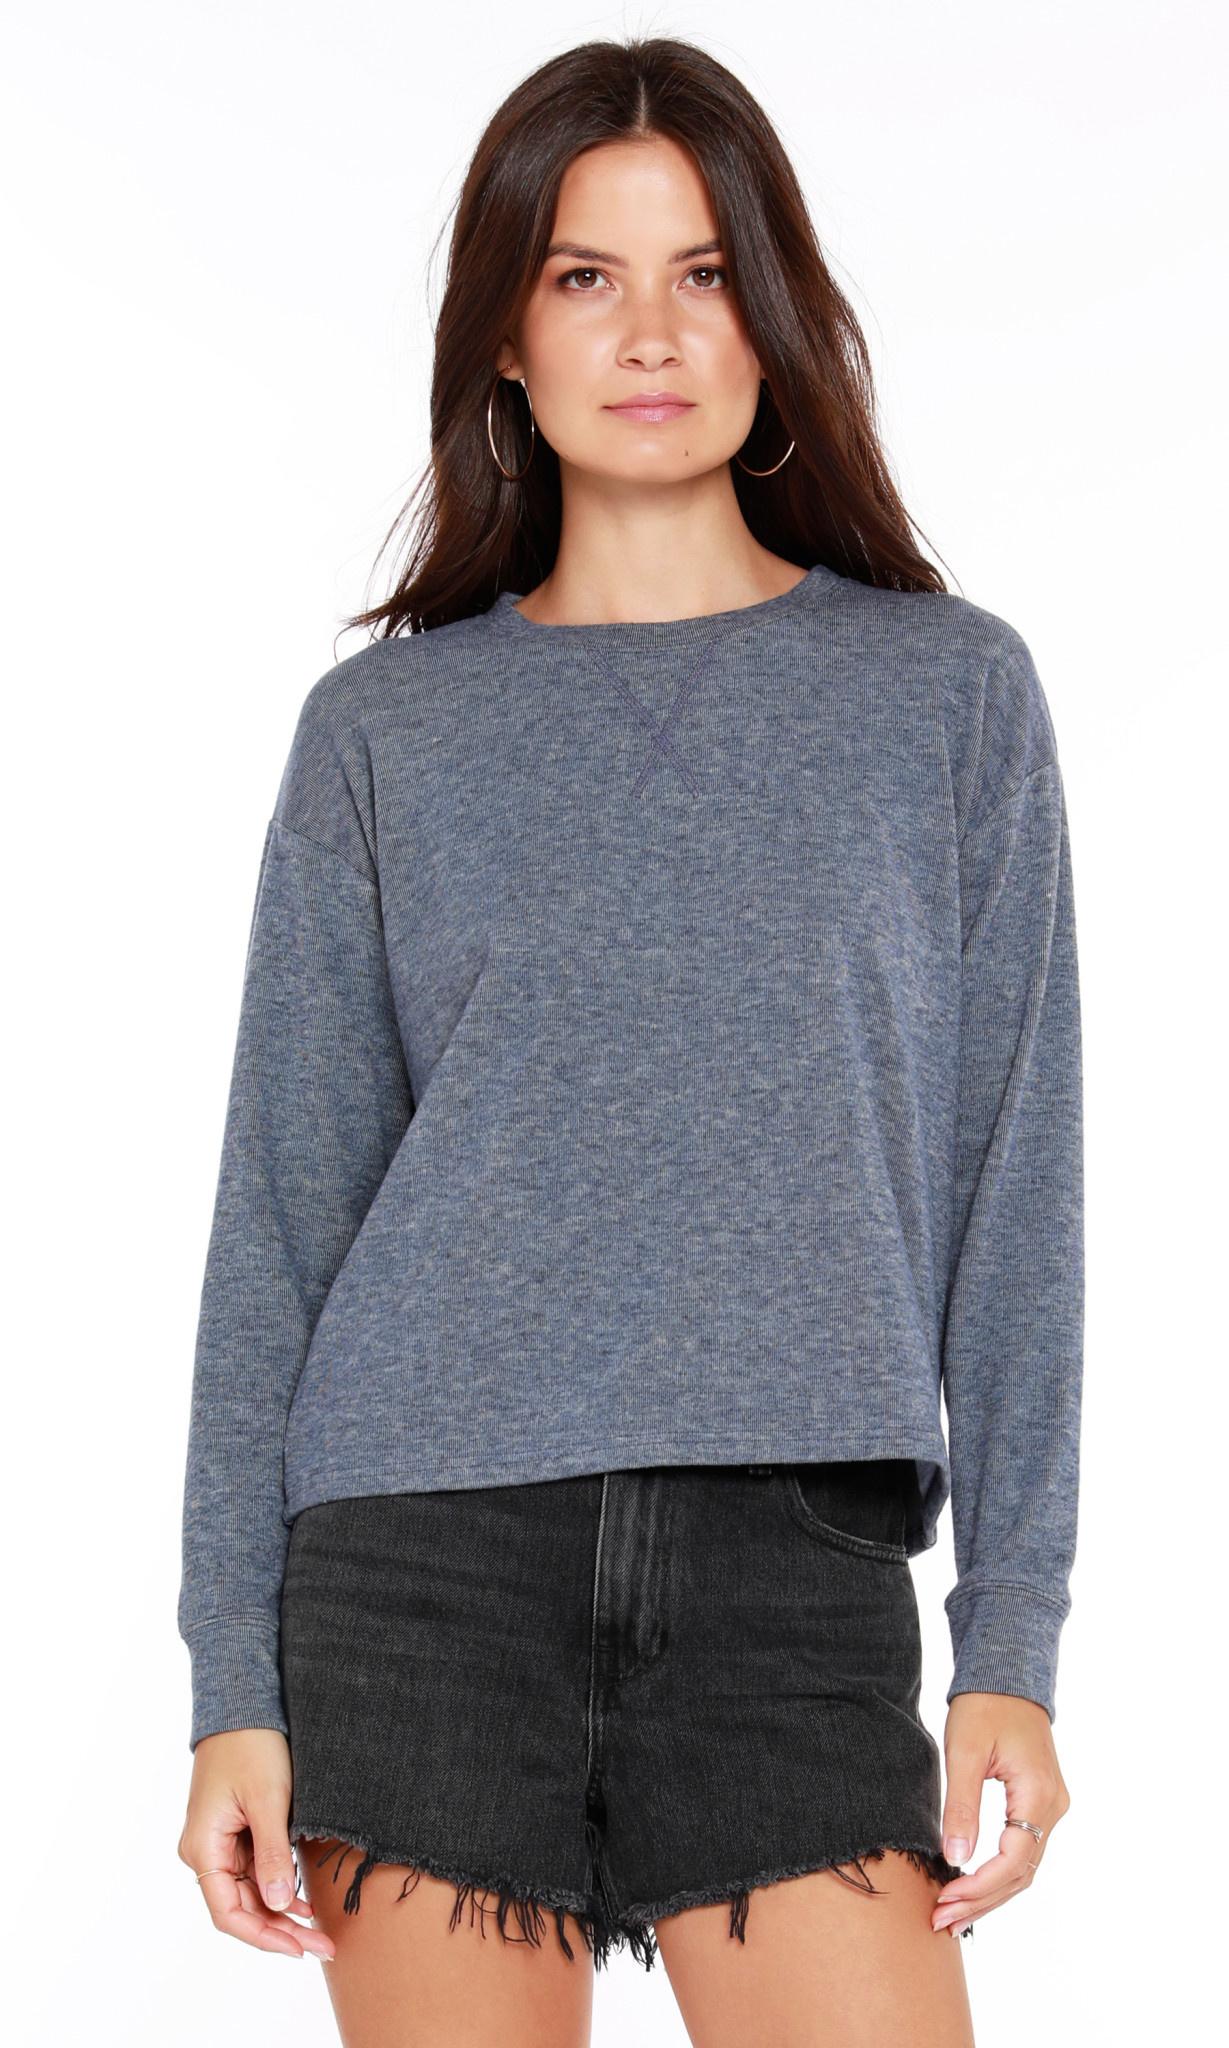 Cozy Heathered Long Sleeve Top